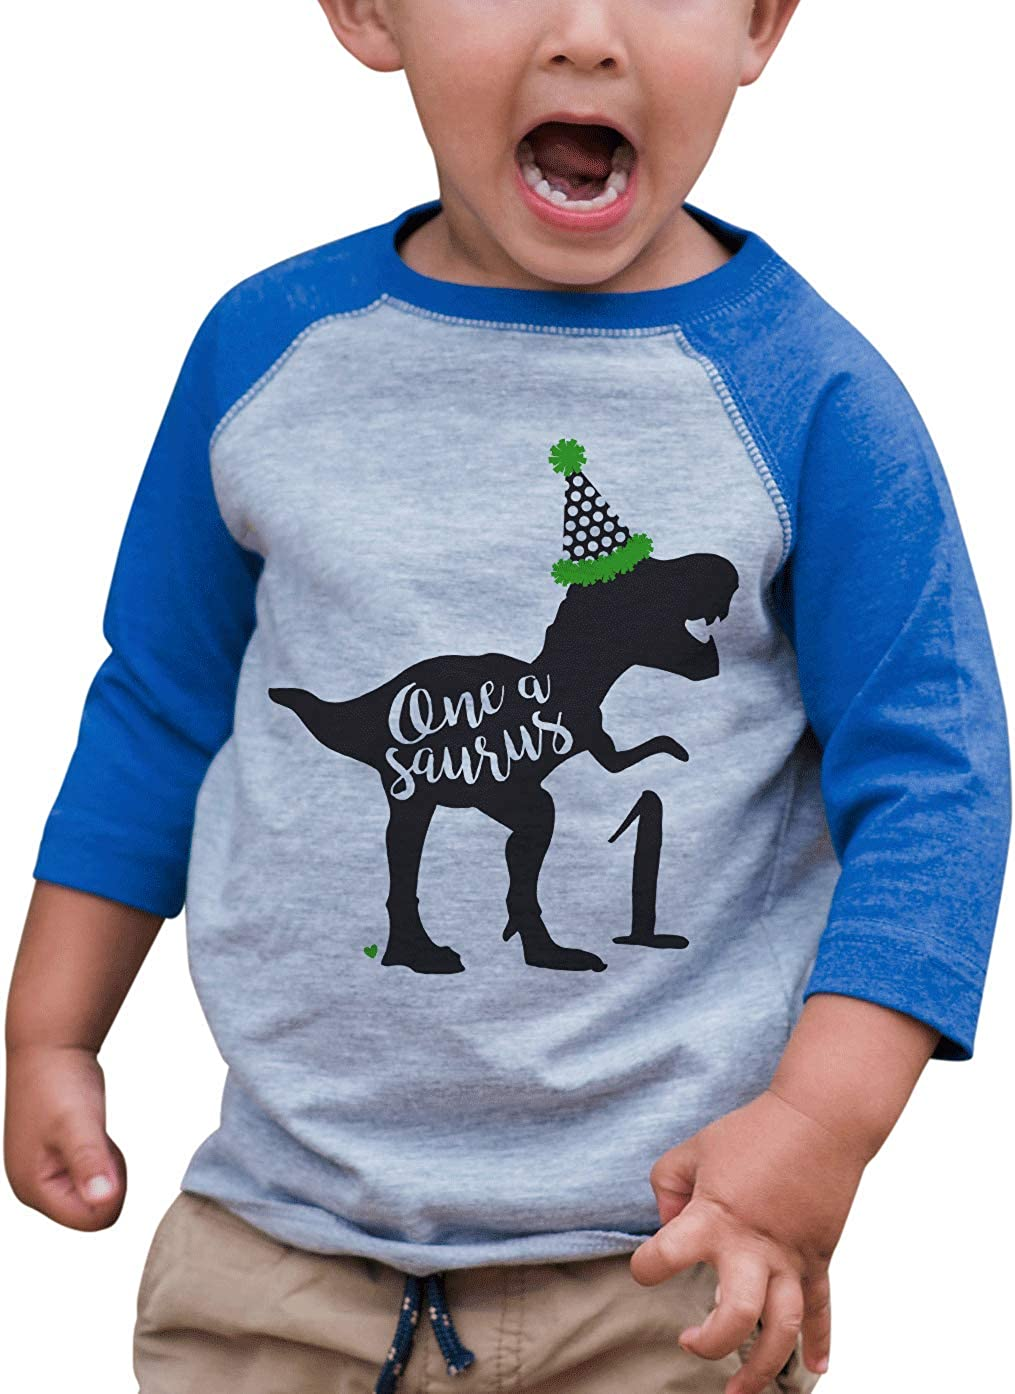 7 ate 9 Apparel Kid's One 1st 1 First Dinosaur Dino Birthday Blue Raglan Tee